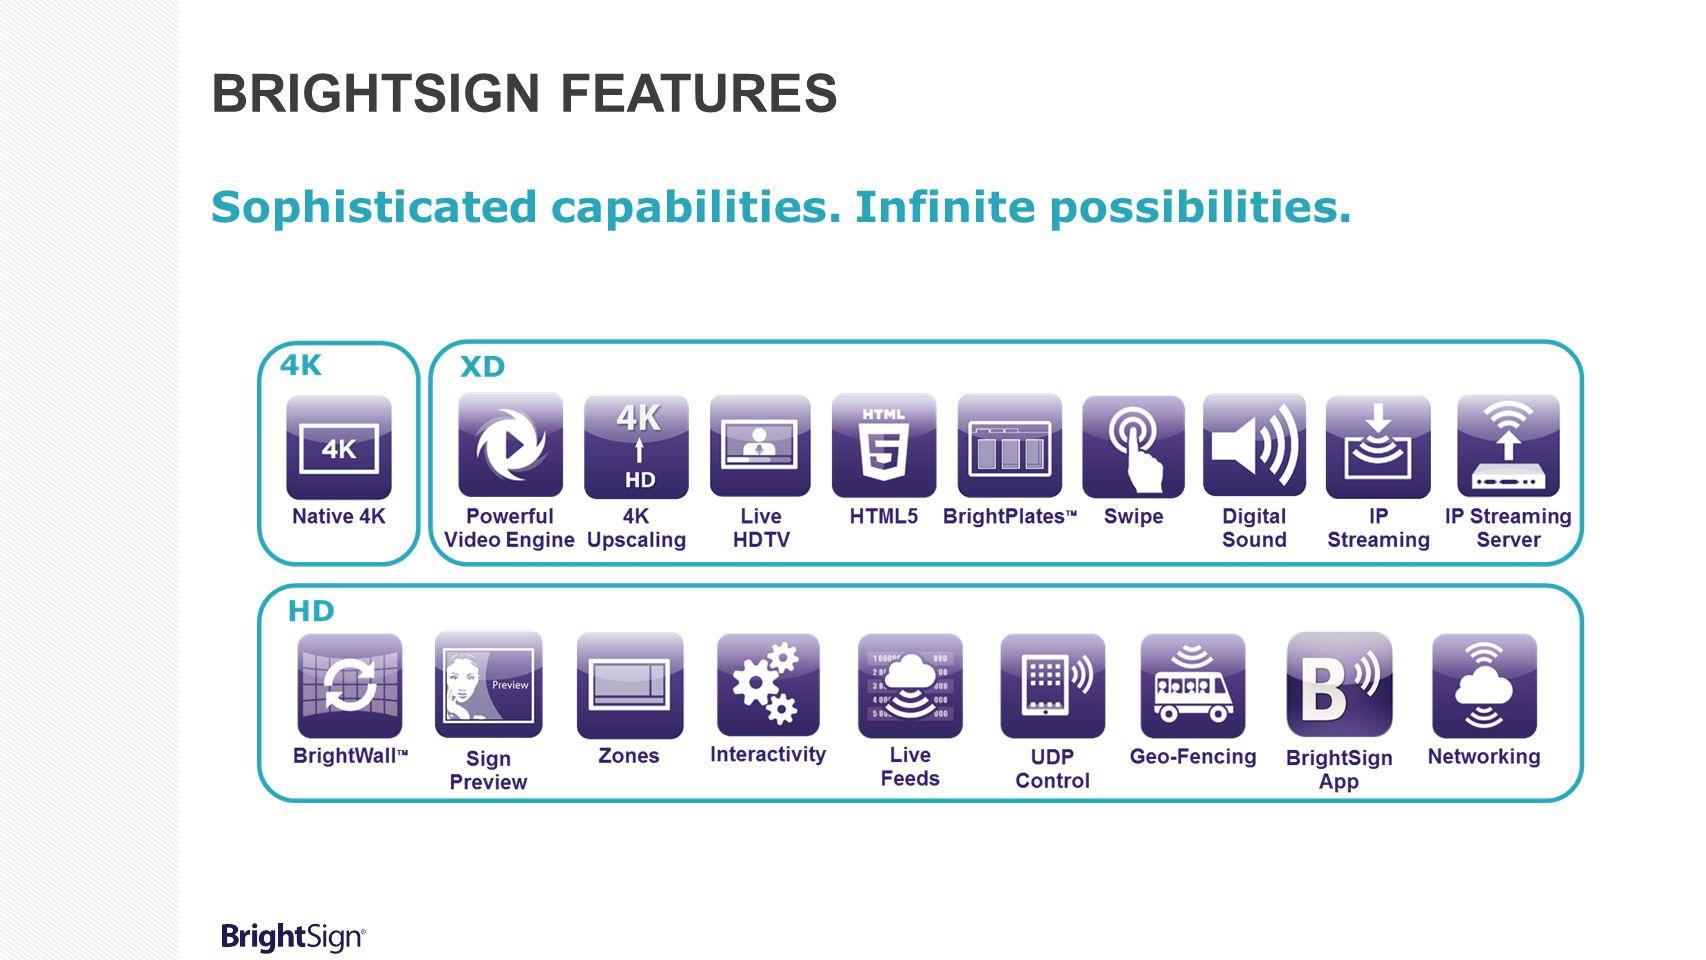 BRIGHTSIGN FEATURES Sophisticated capabilities. Infinite possibilities.